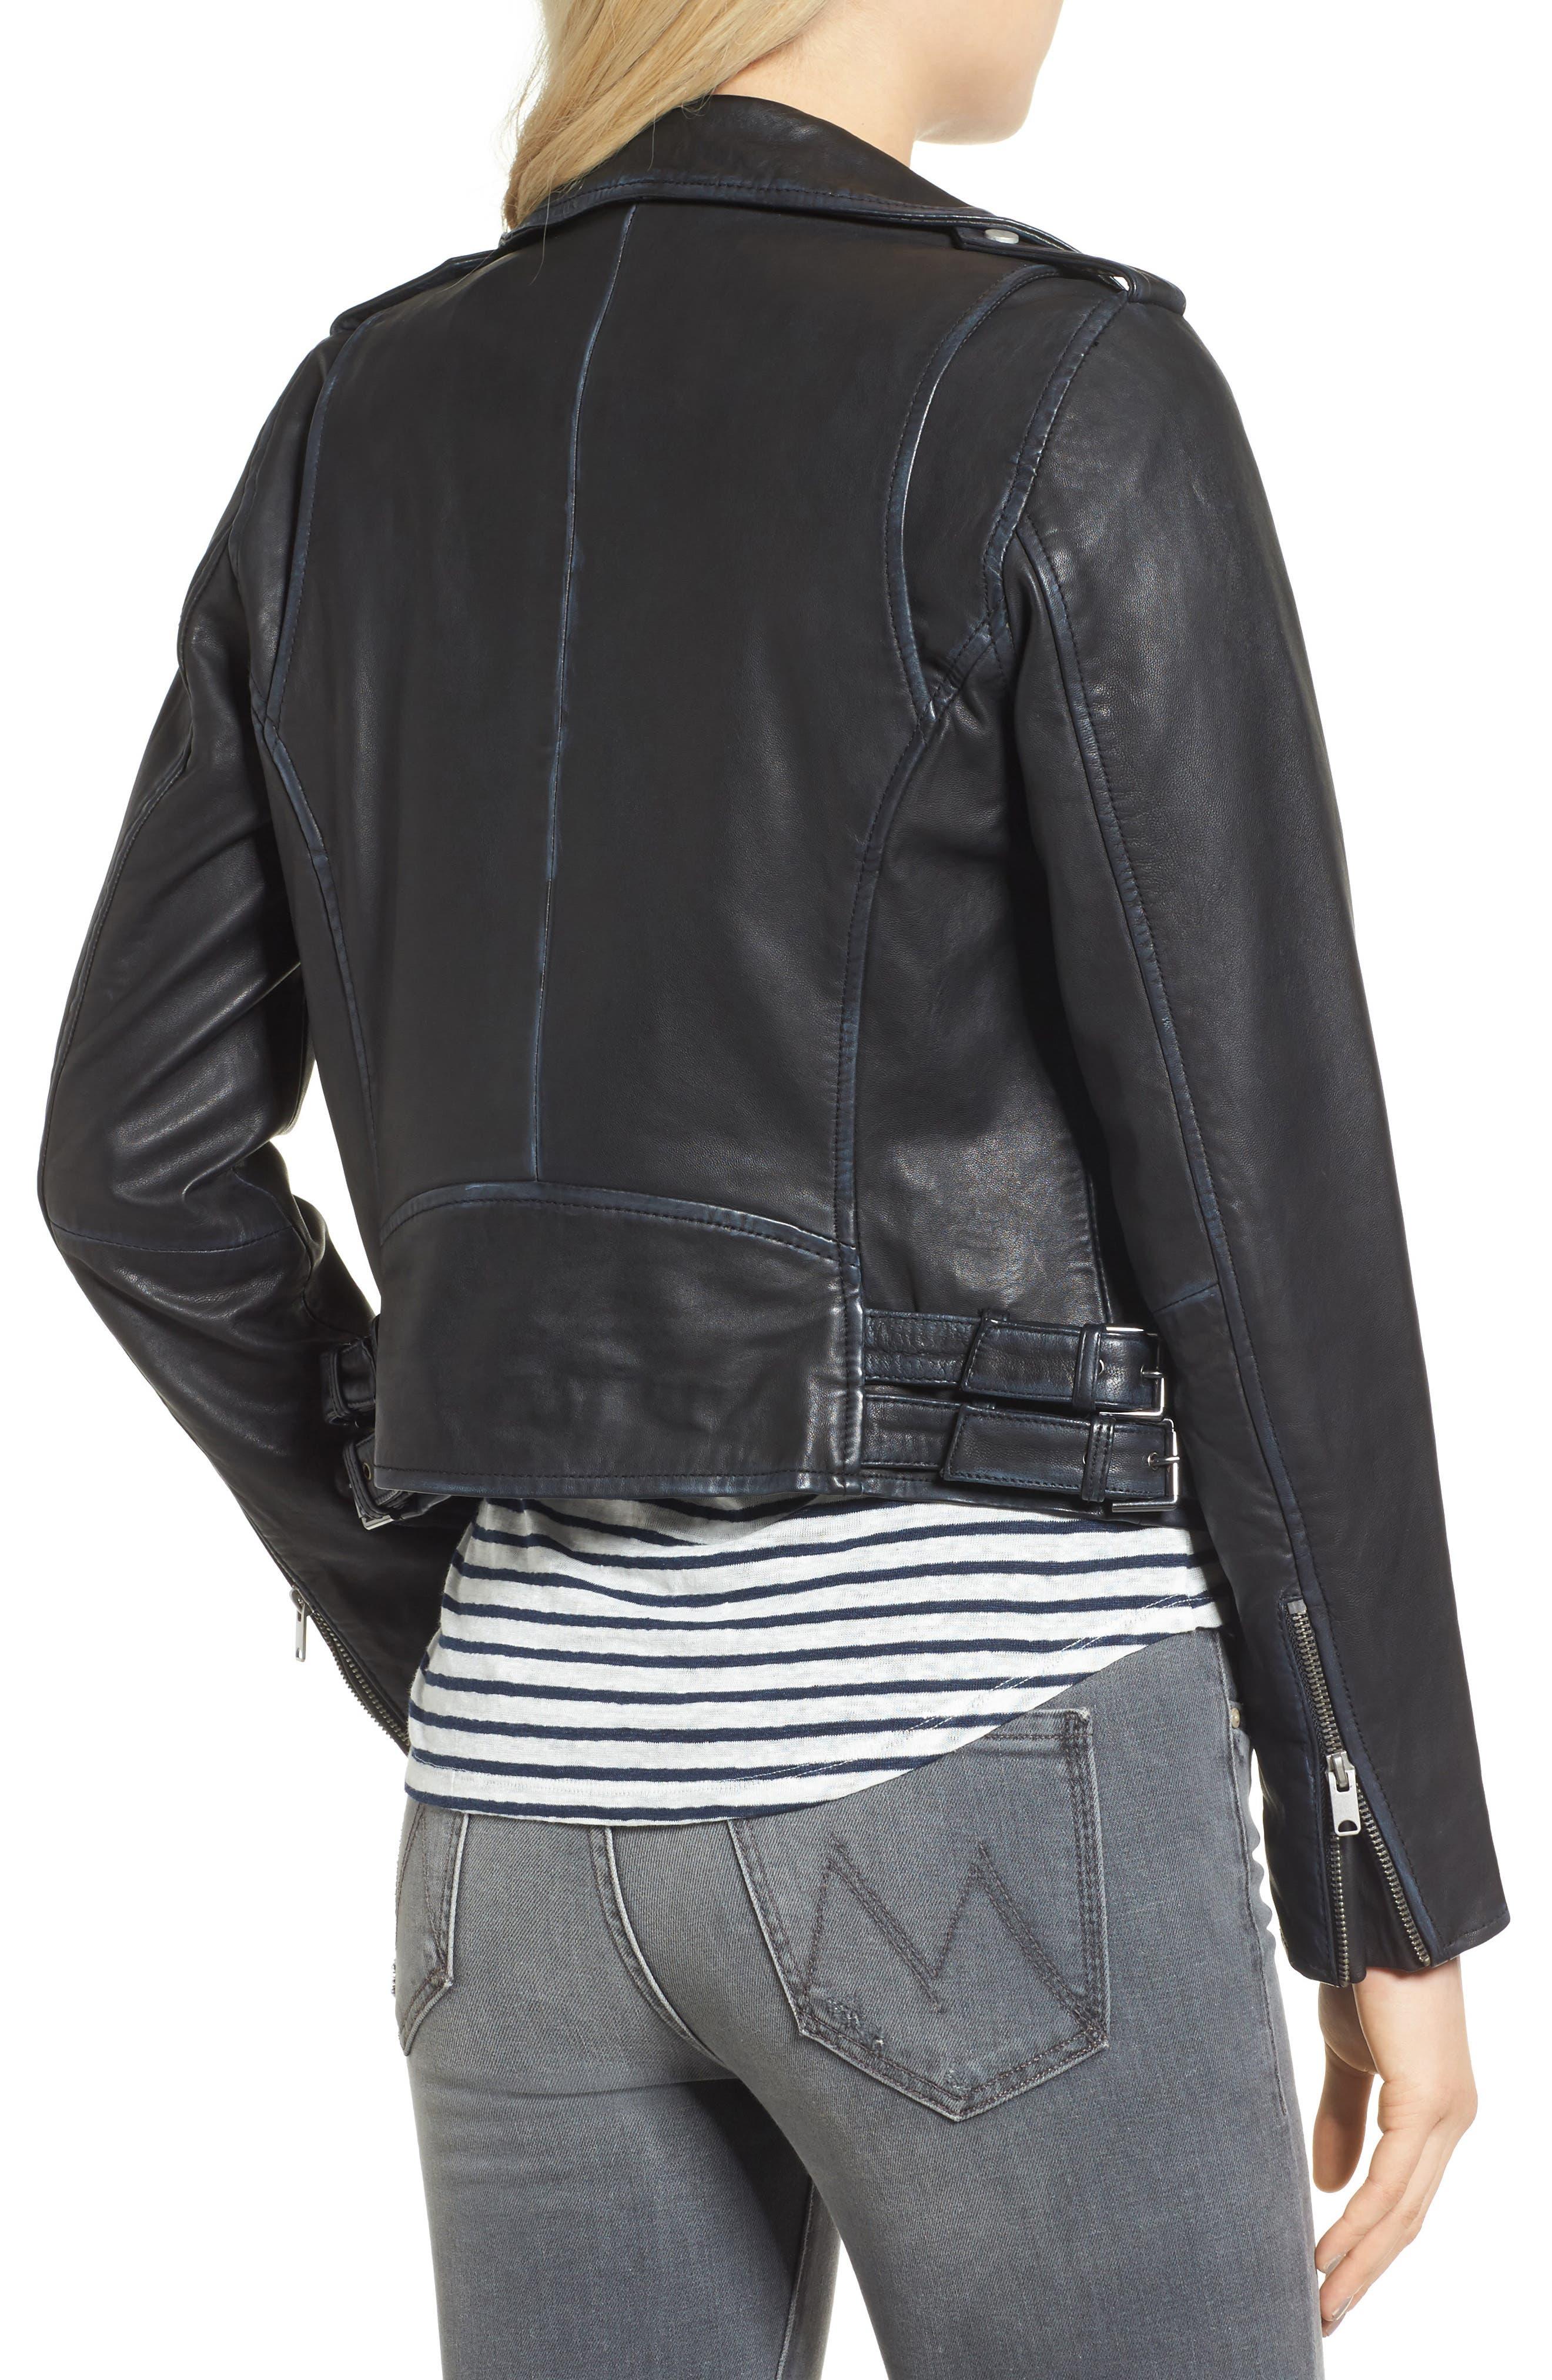 Whitney Washed Leather Crop Jacket,                             Alternate thumbnail 2, color,                             Black